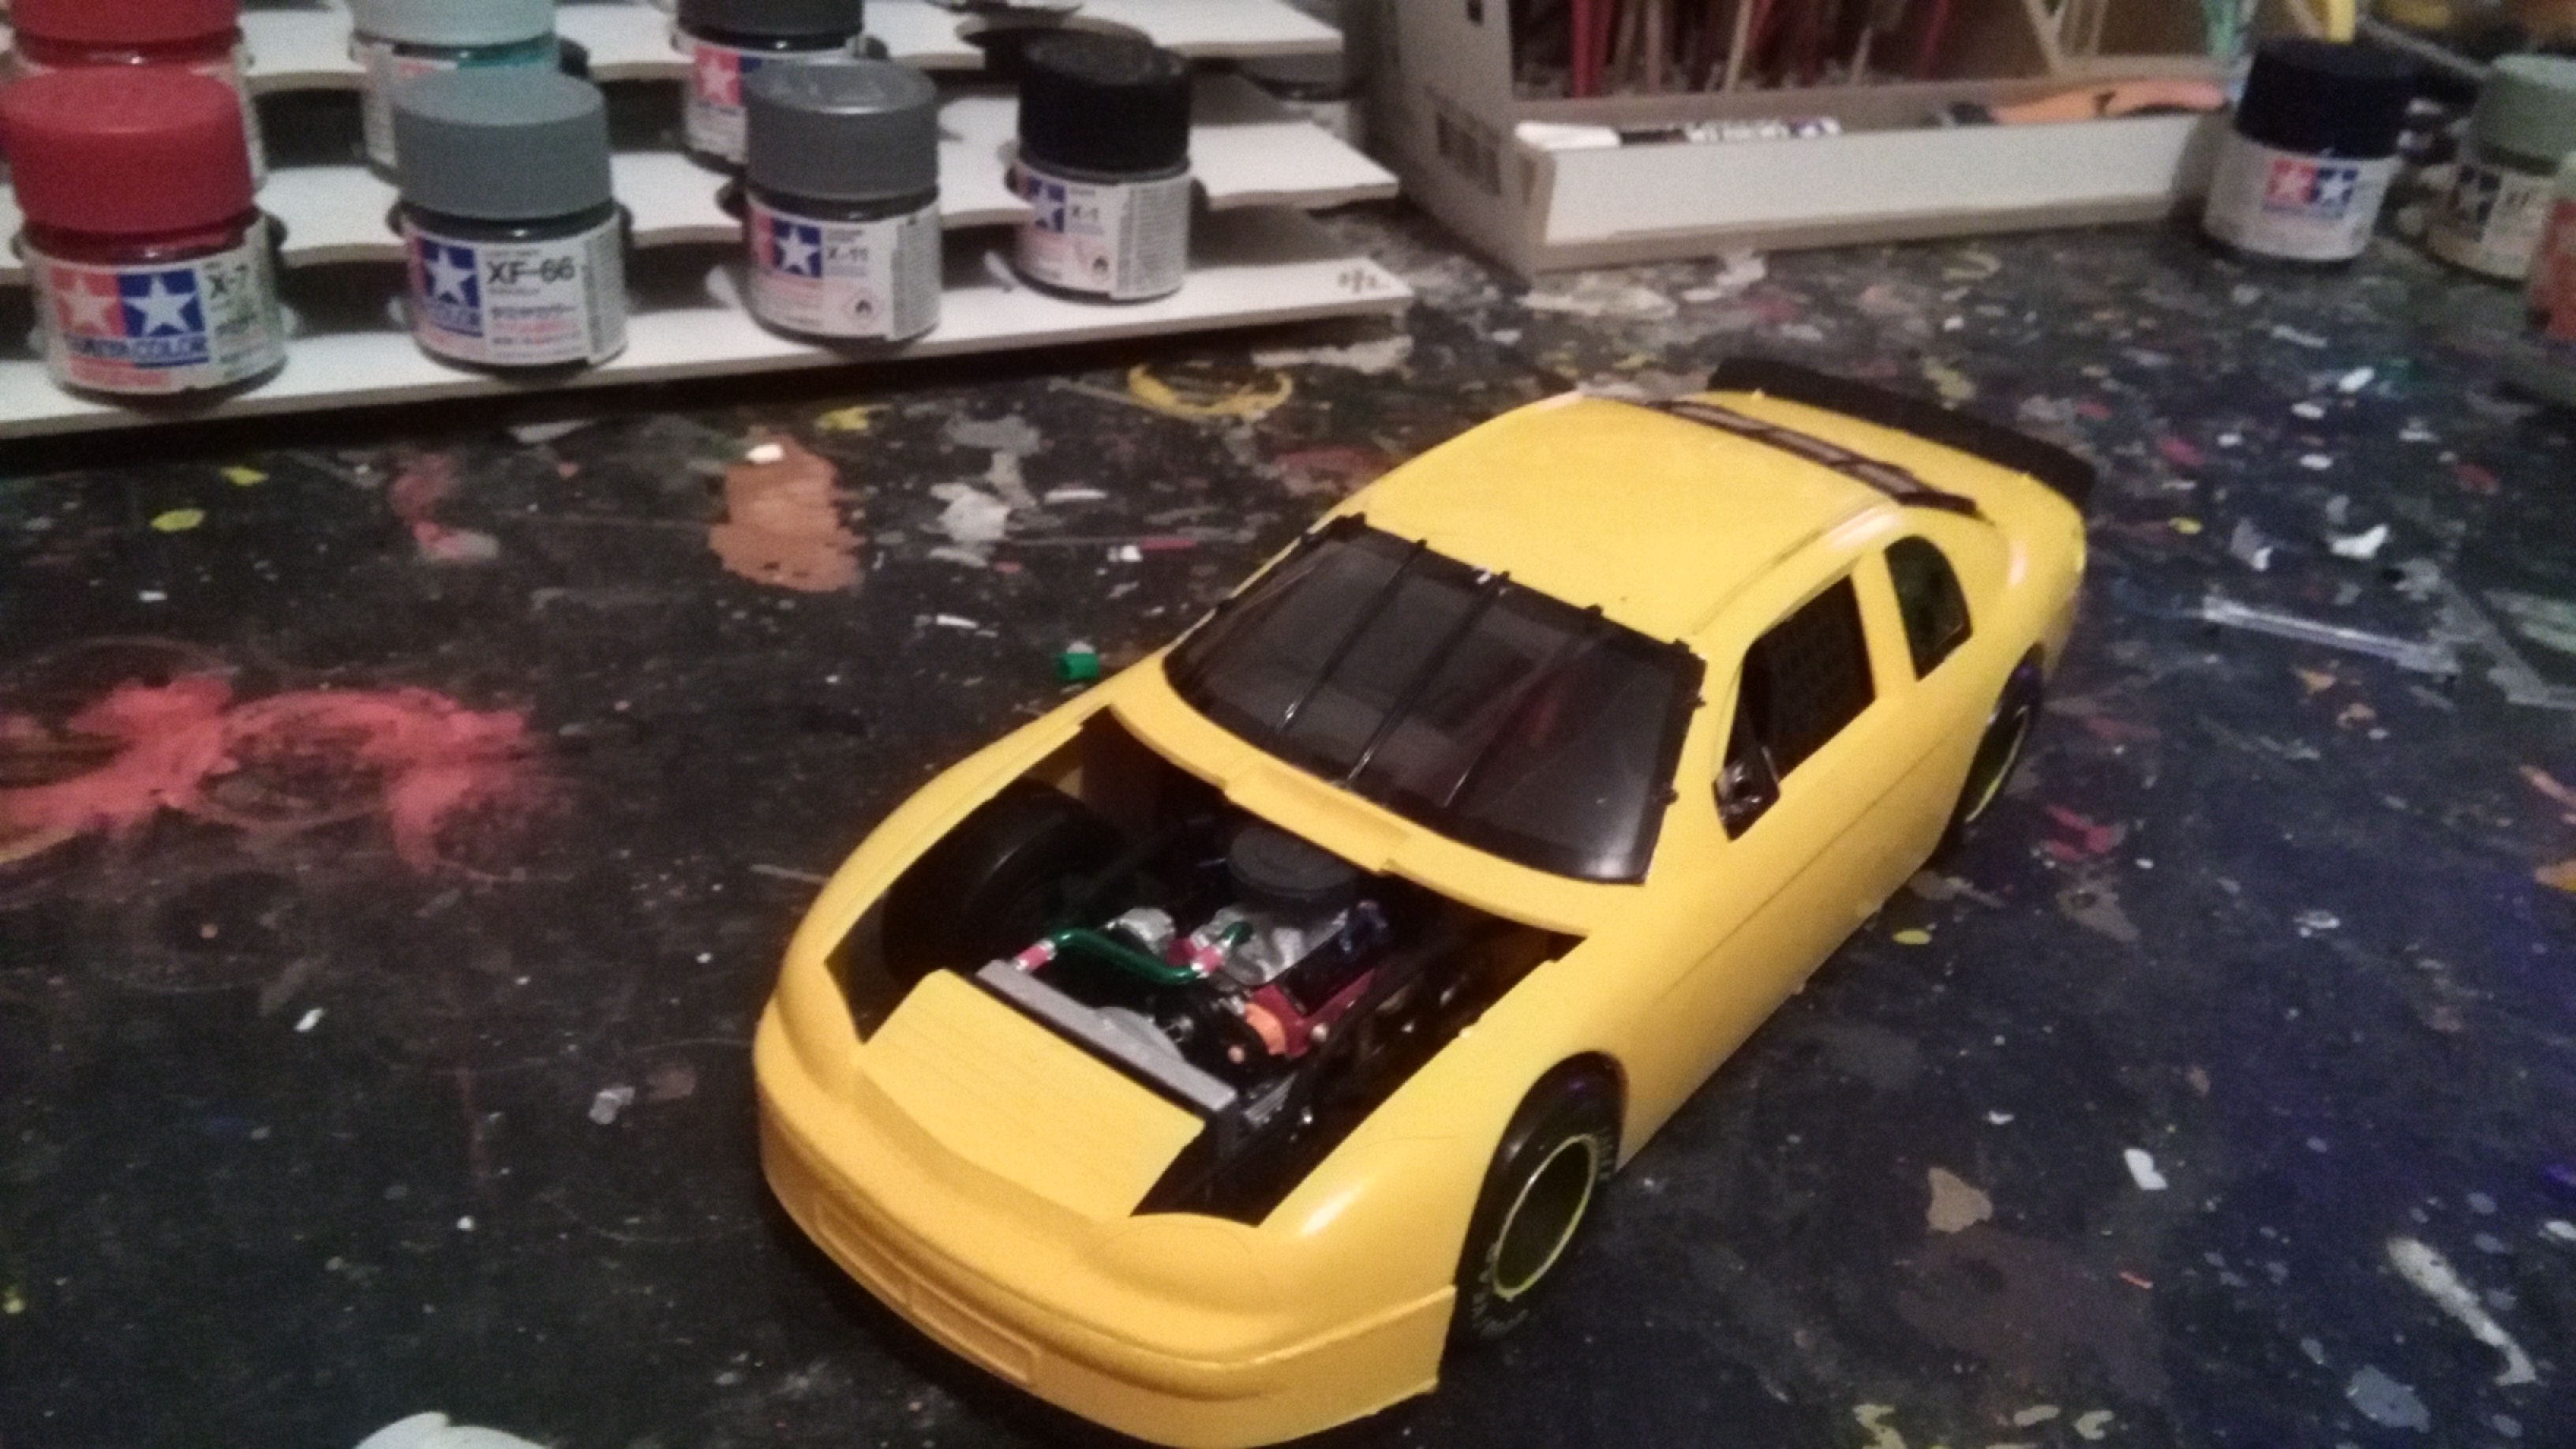 Chevy Monte-Carlo 1998 #4 Bobby Hamilton Kodak  390182C1998417